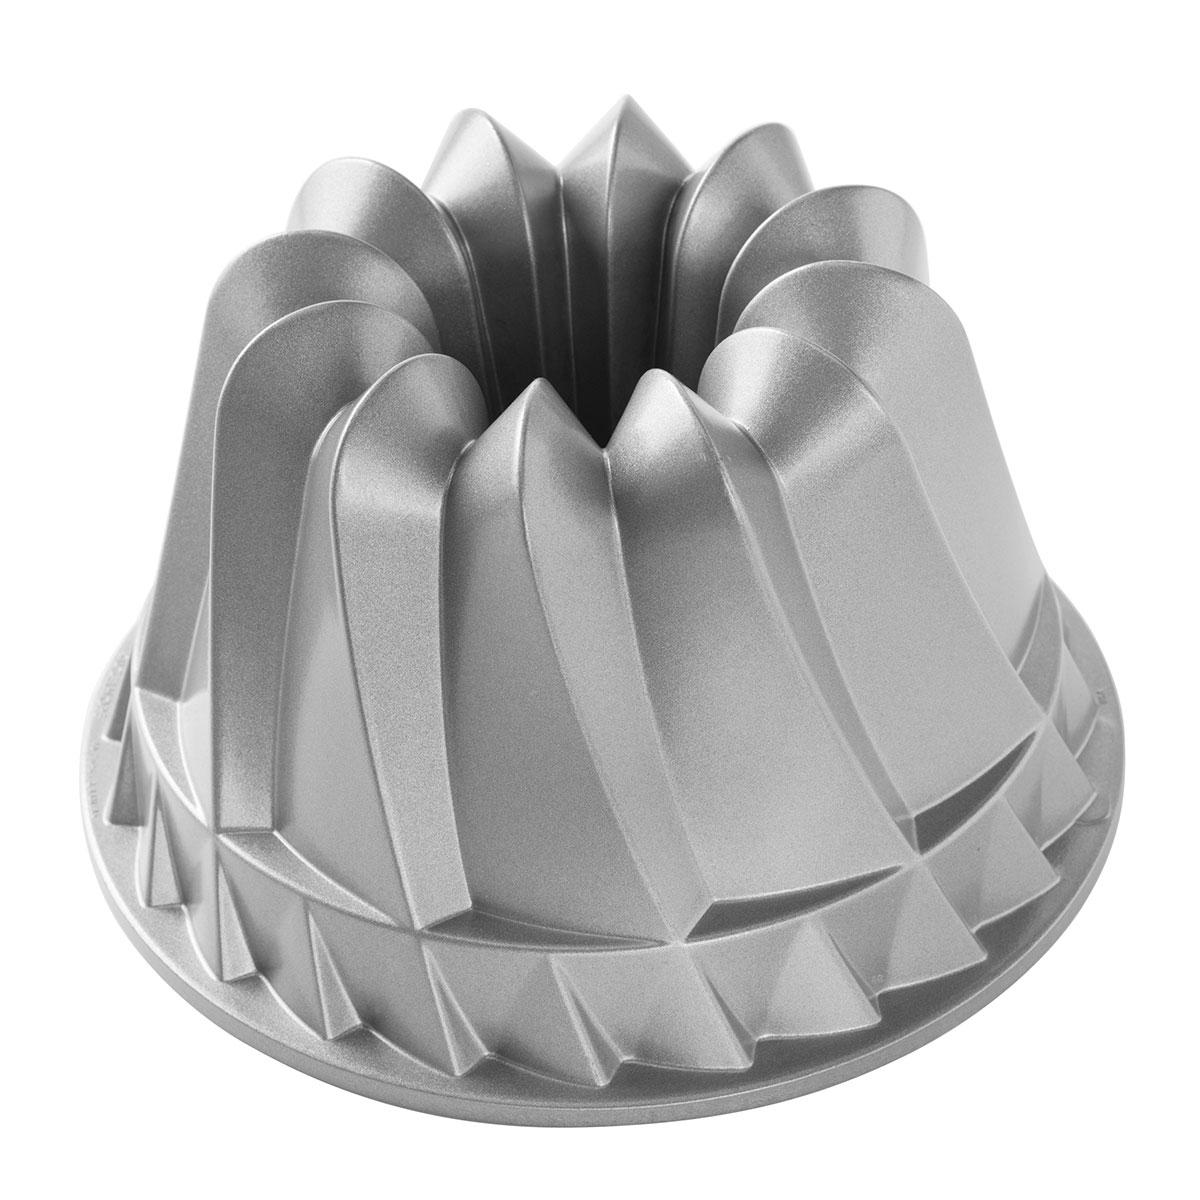 Image of   Nordic Ware randform - Kugelhopf Bundt Pan